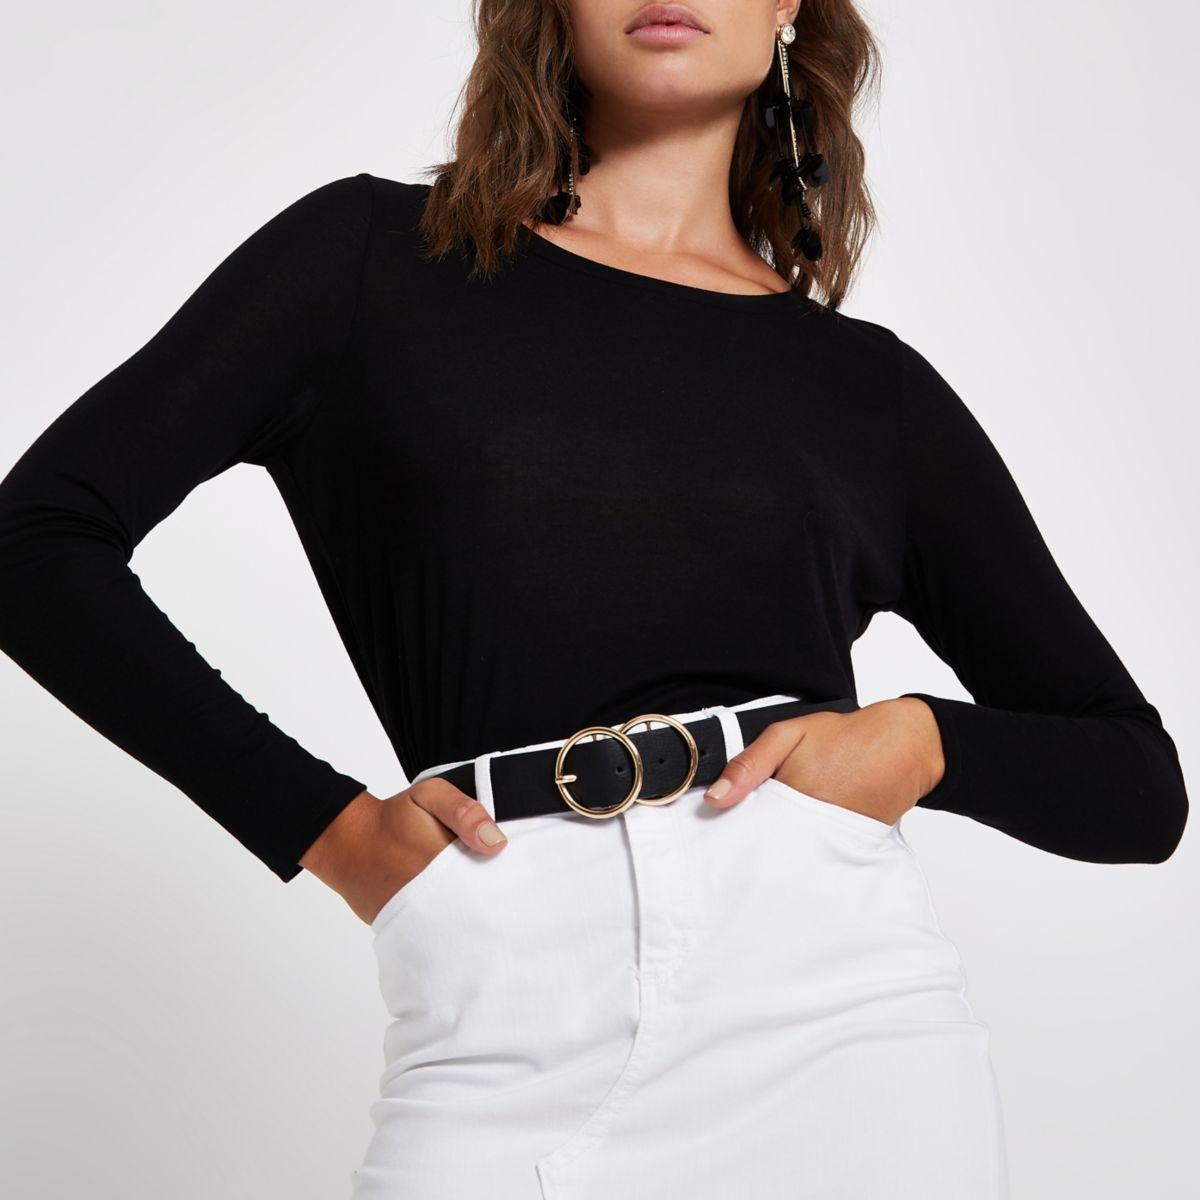 Black scoop neck long sleeve T-shirt